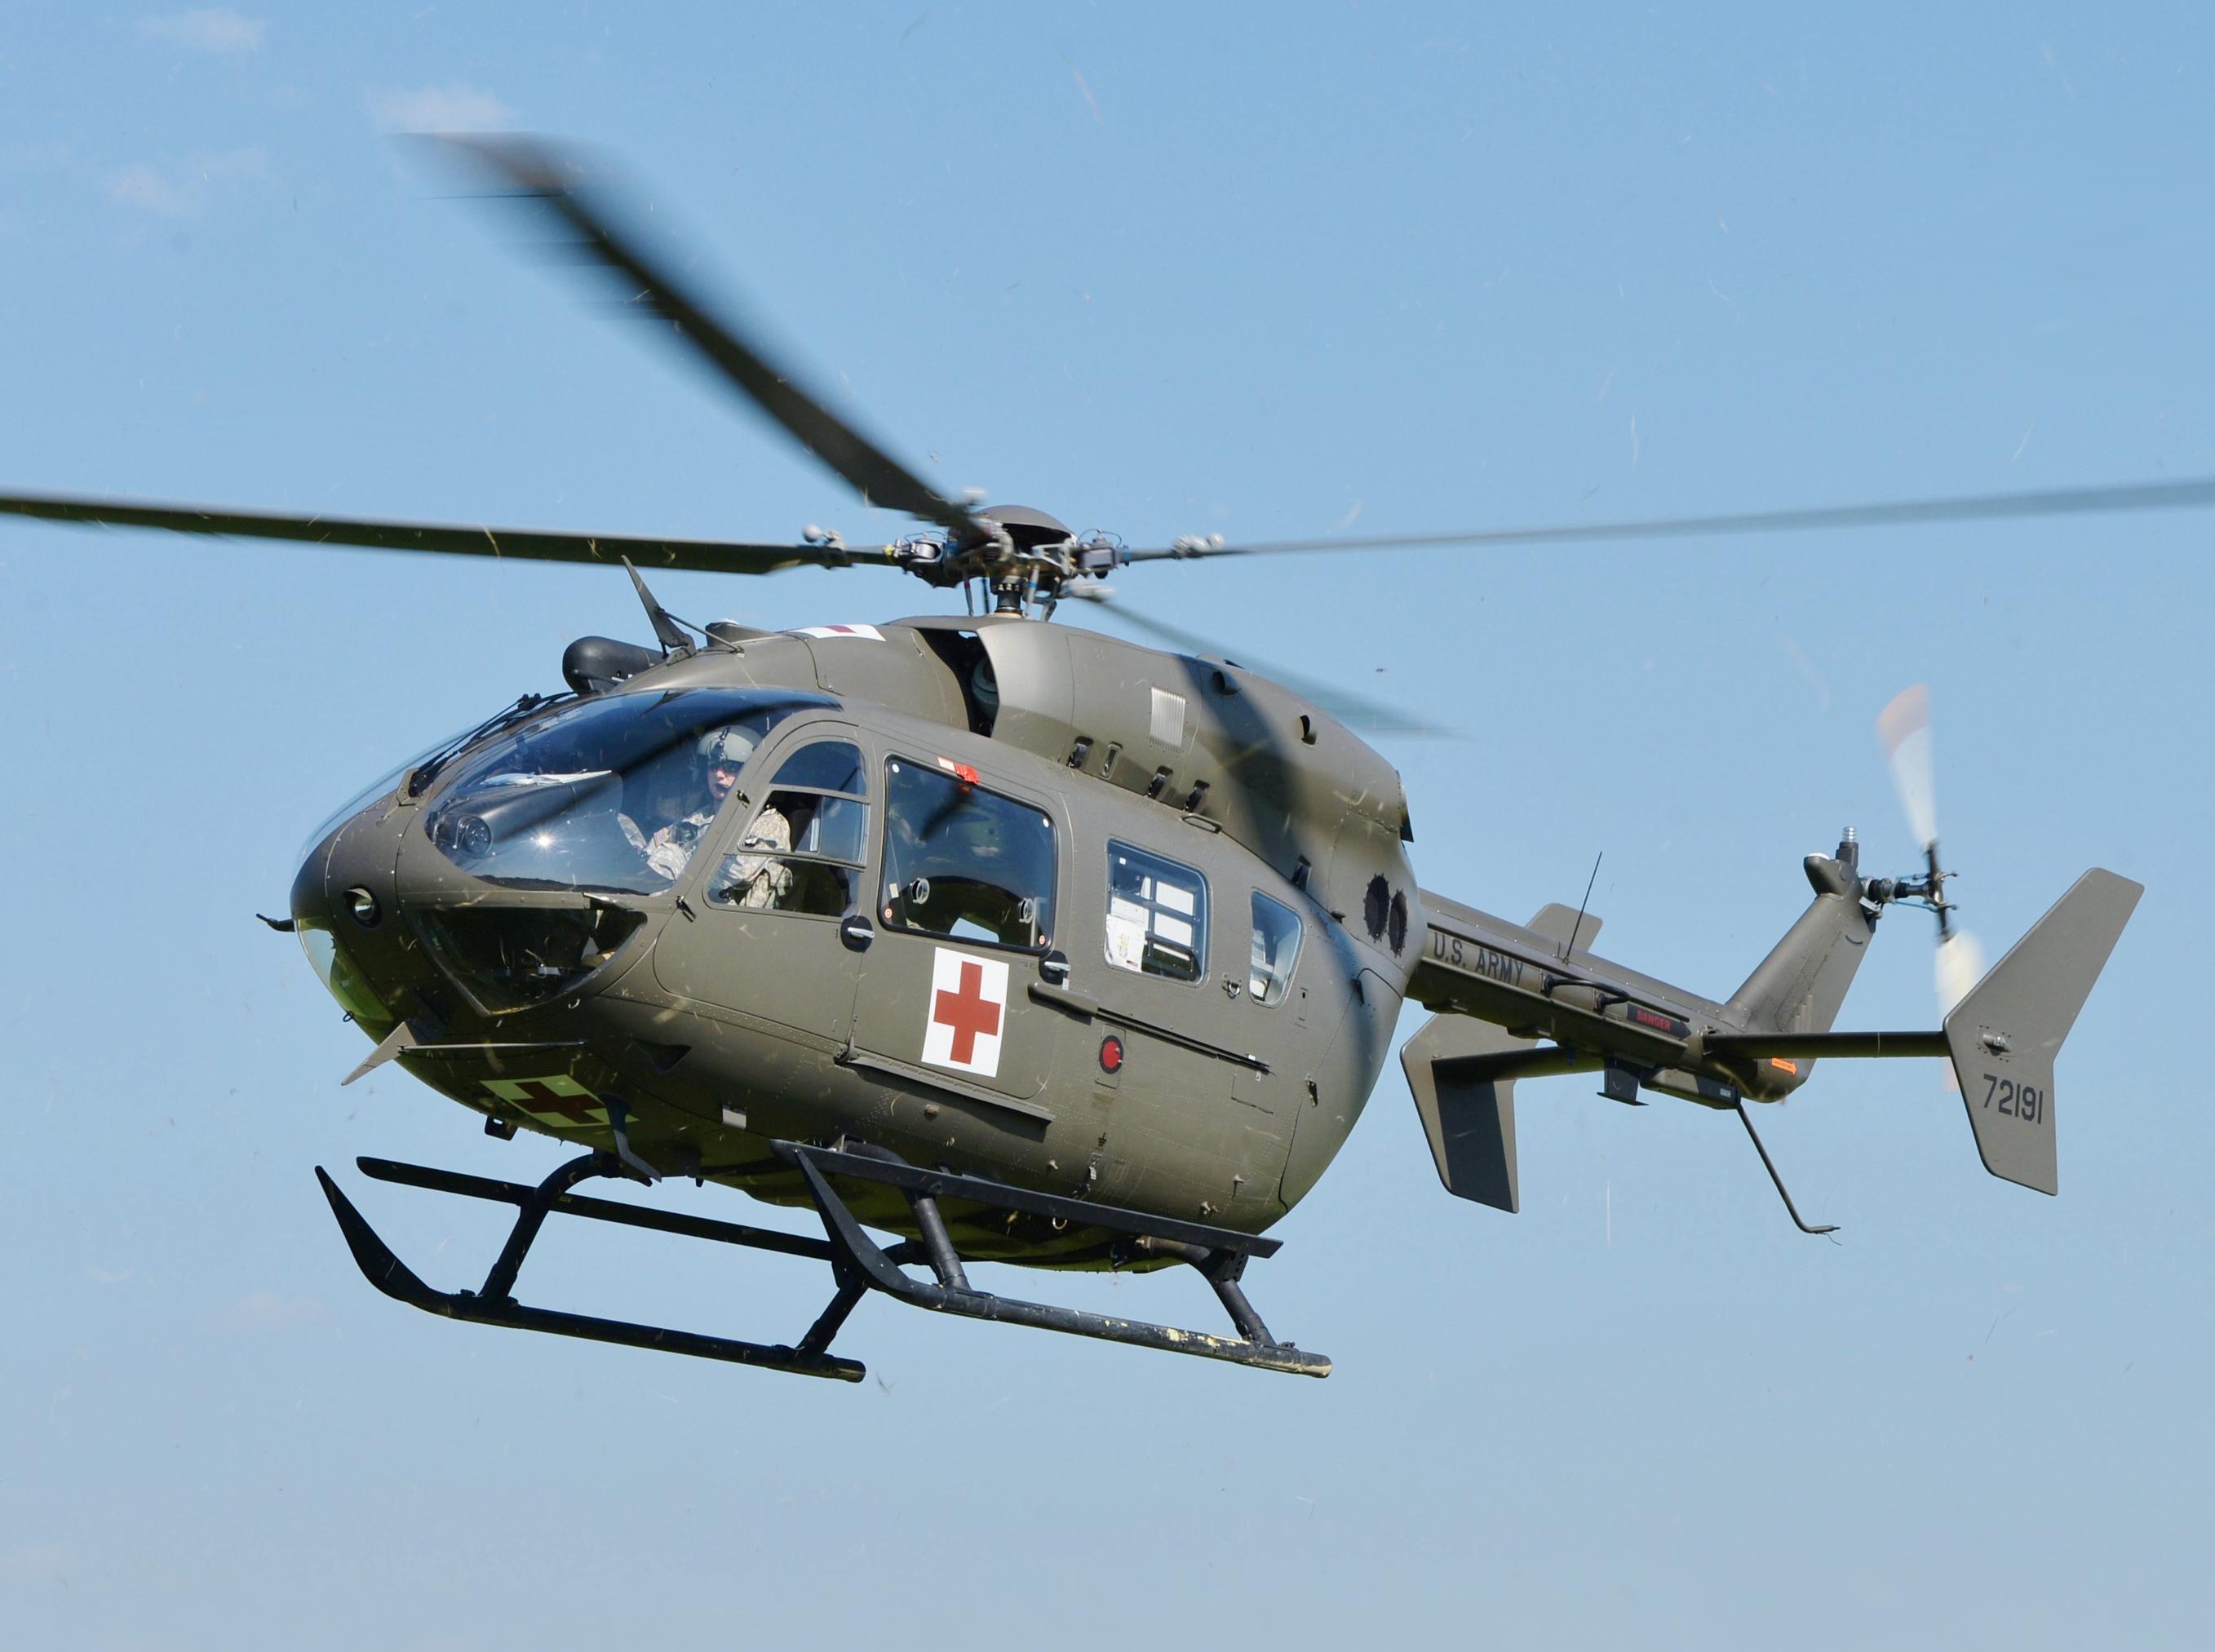 Eurocopter UH-72 Lakota - Wikipedia